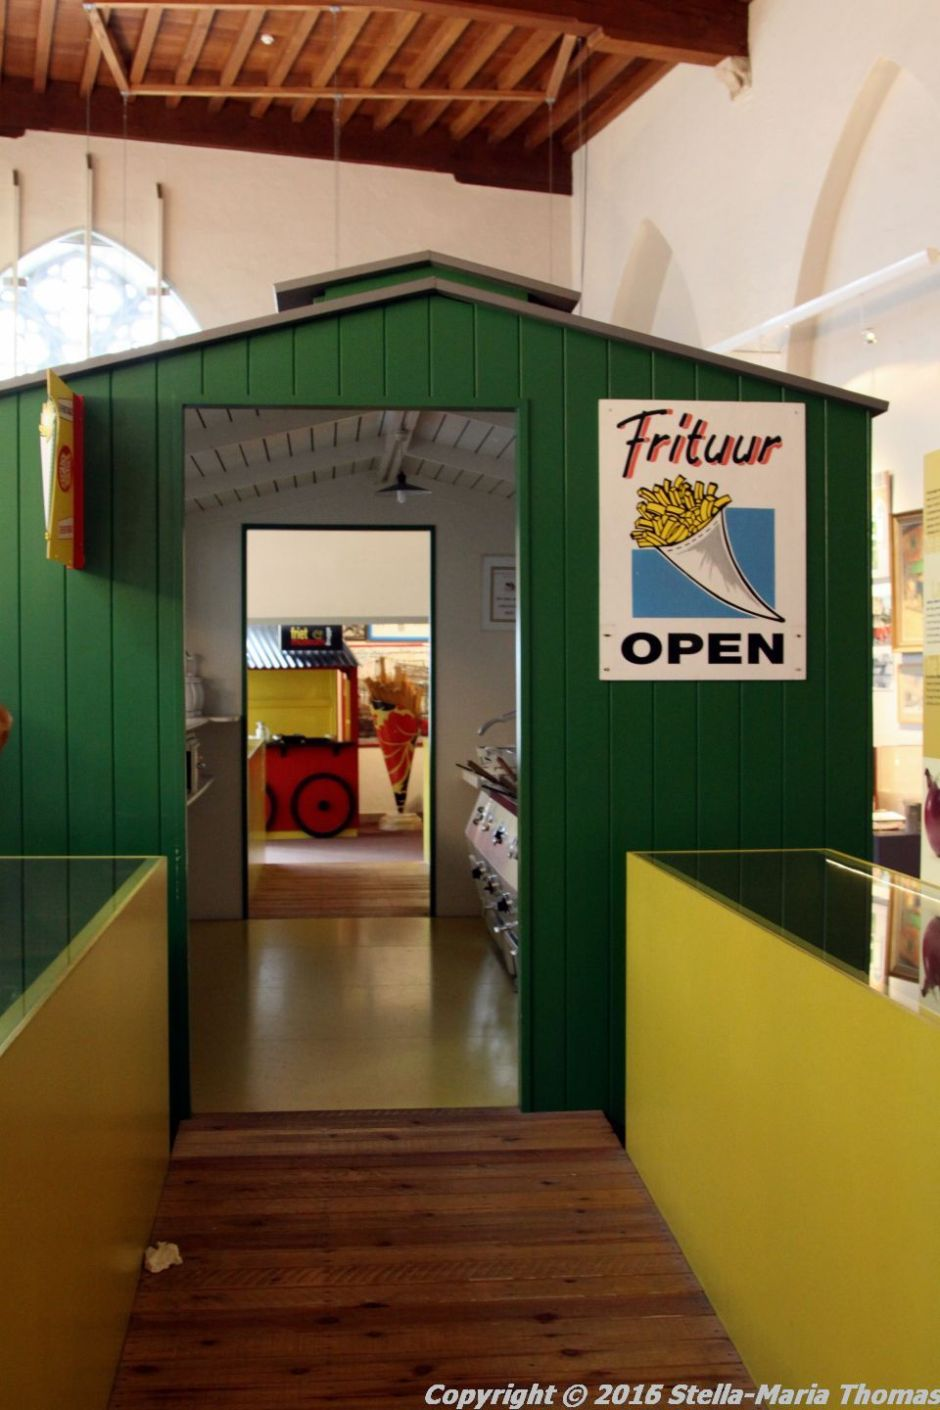 frites-museum-005_23795794605_o